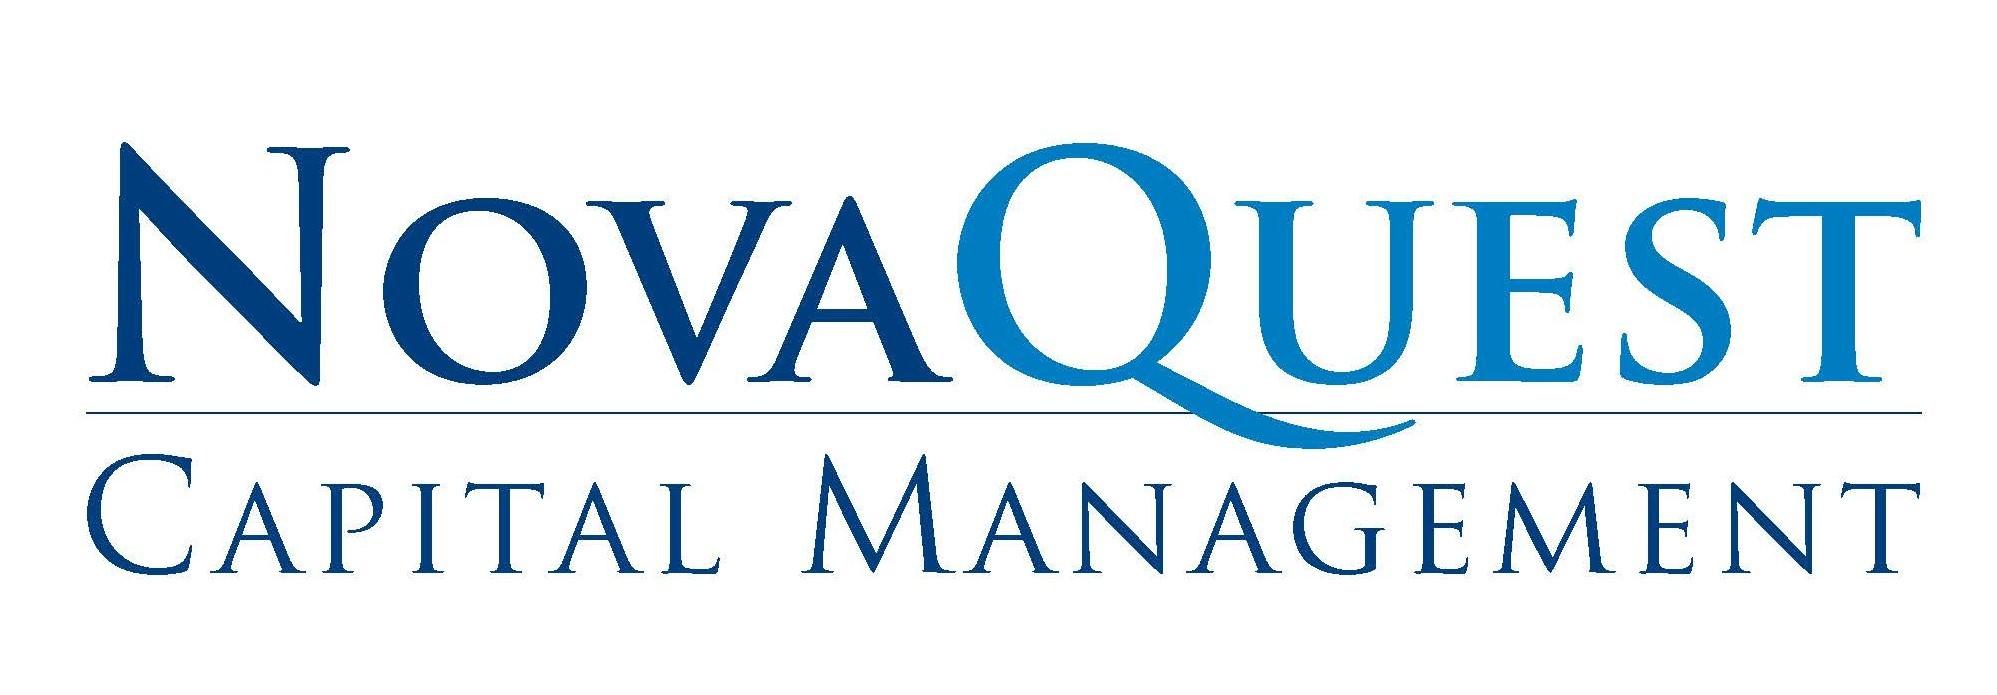 NovaQuest Capital Management to Acquire Viamet ...